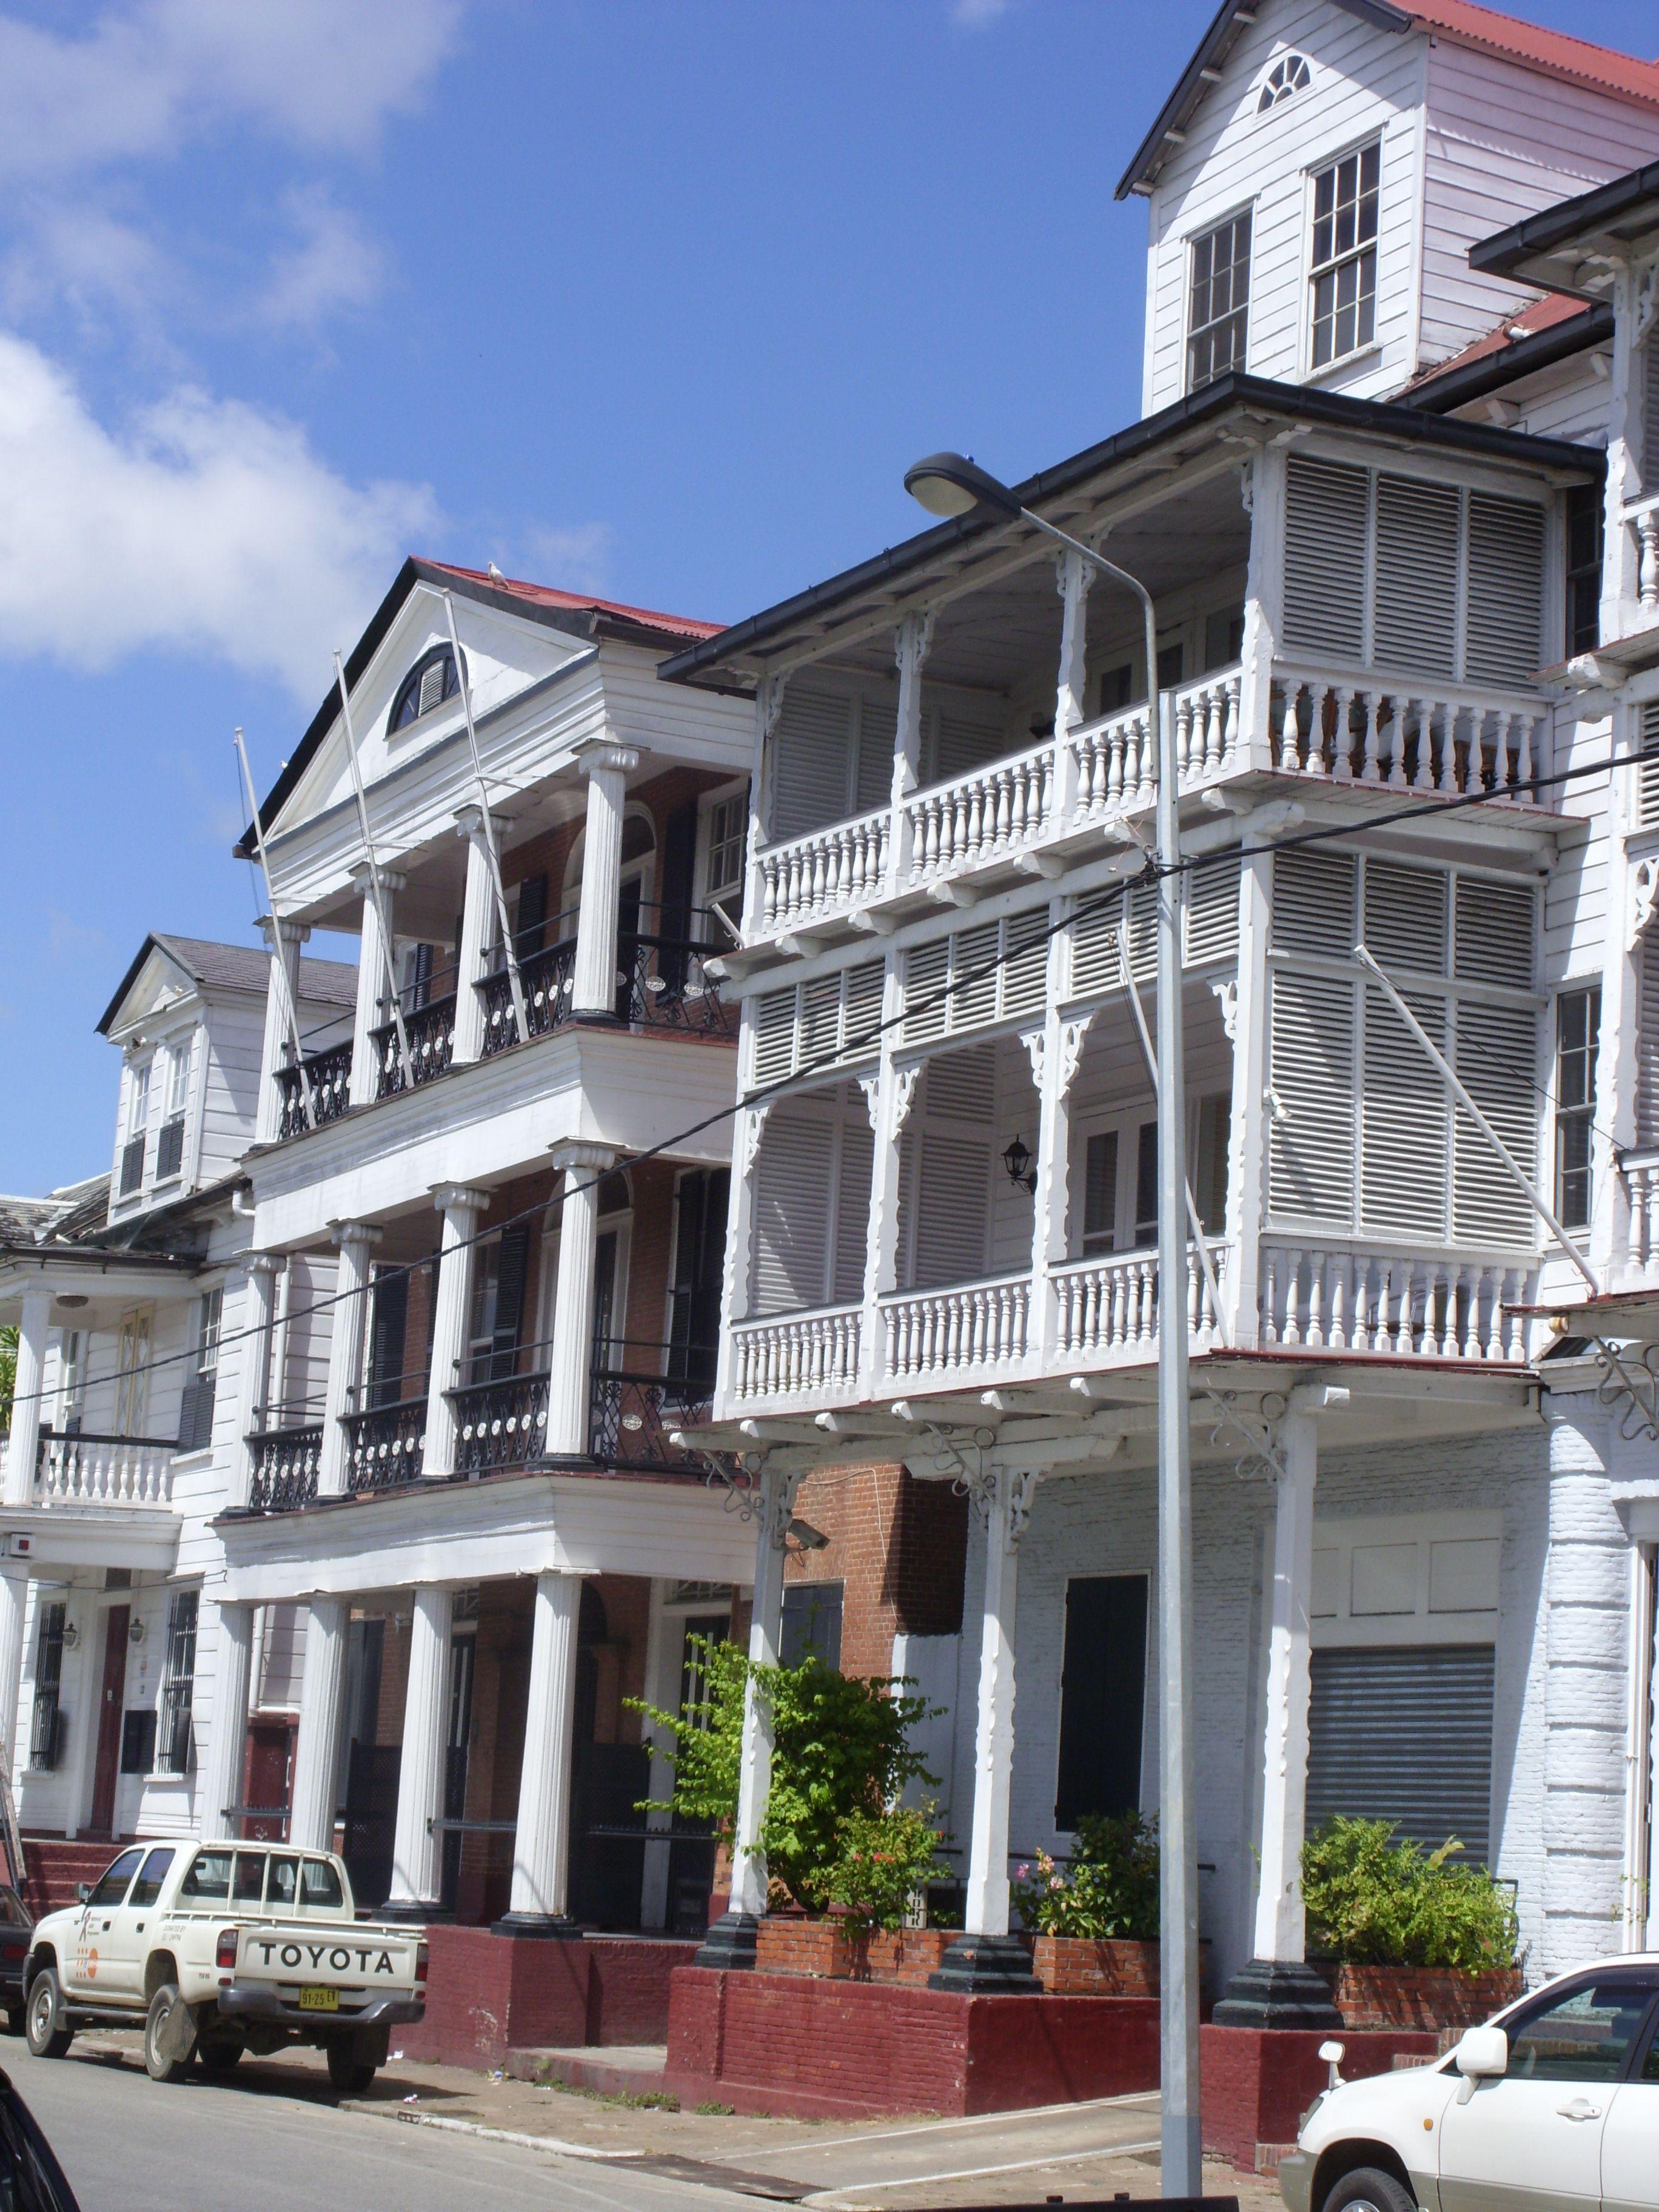 Waterkant #Paramaribo #Suriname